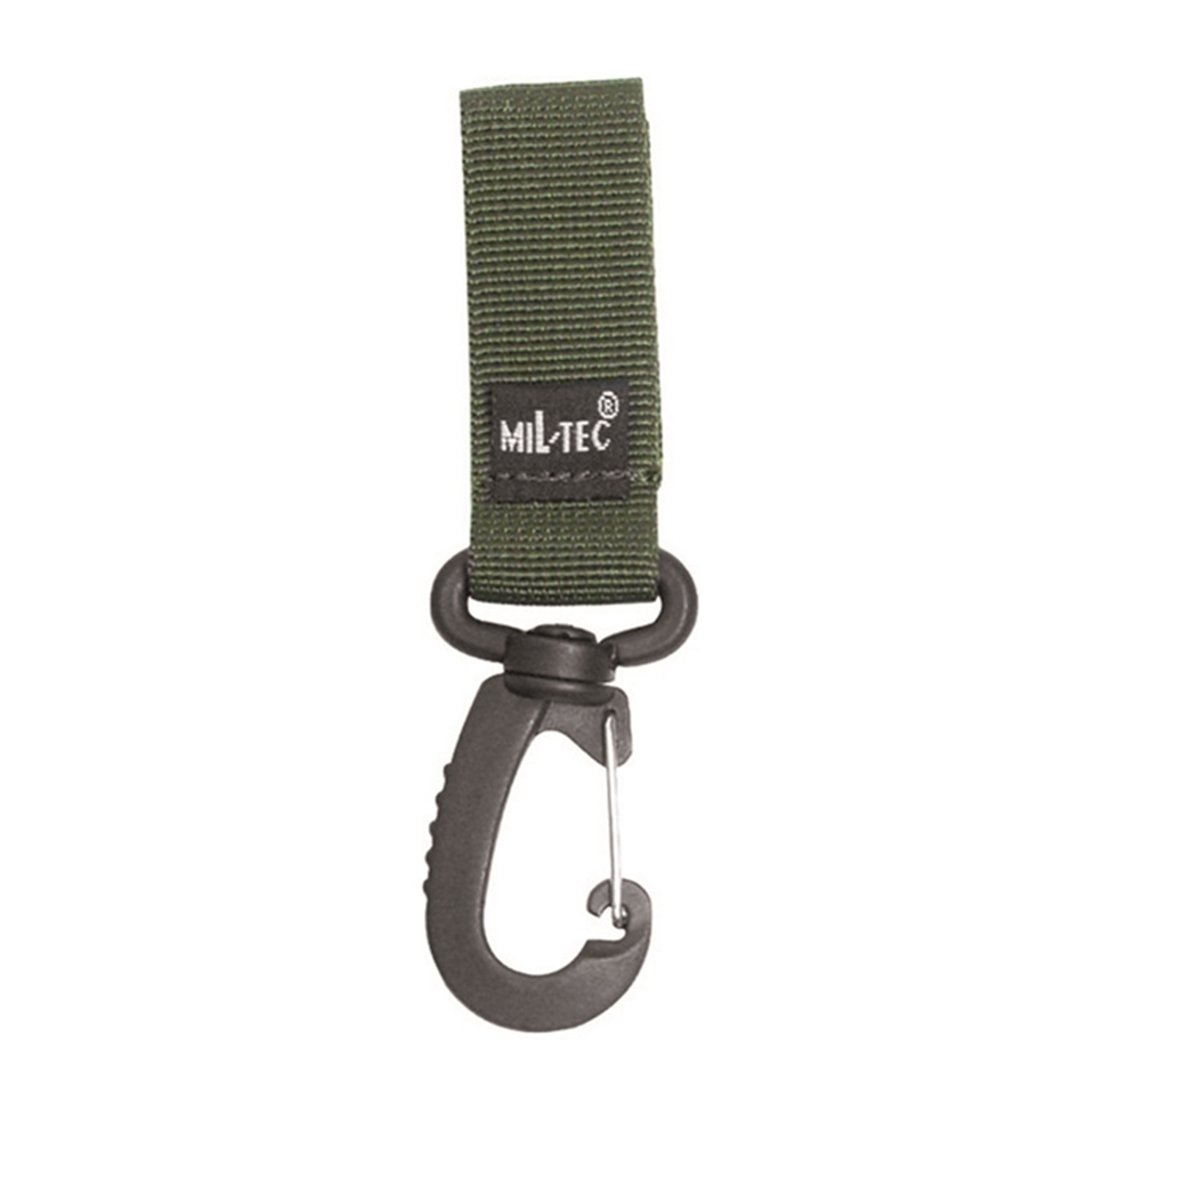 Mil-Tec–tact. Stabilisateur 50mm Rideau avec karab. MILTEC 2229